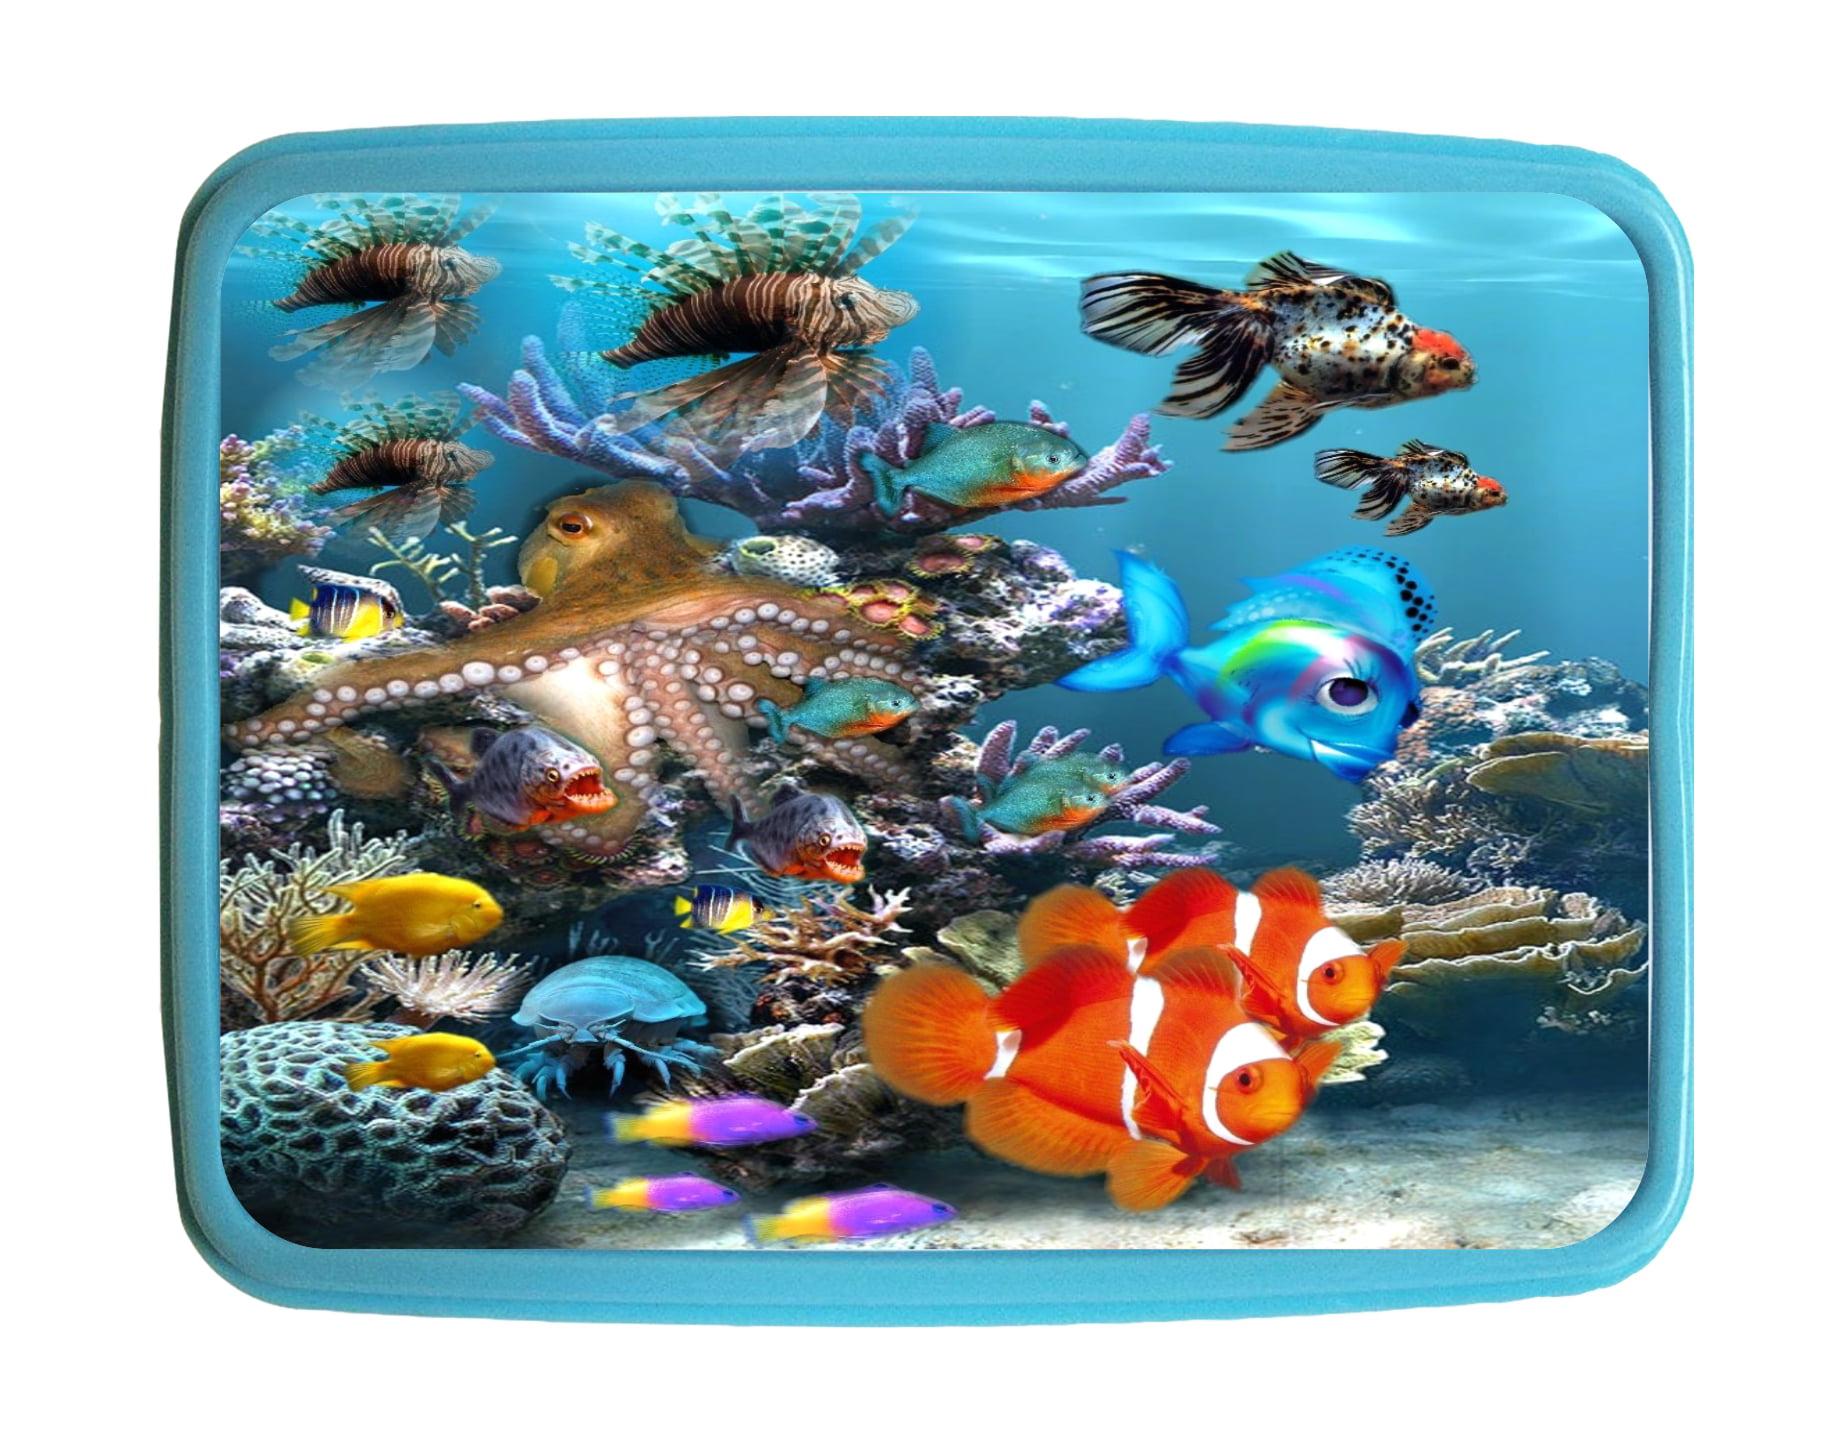 Lunchbox Pets Aquarium Fish Kids Bento Lunch Box With 3 Compartment Food Container Walmart Com Walmart Com